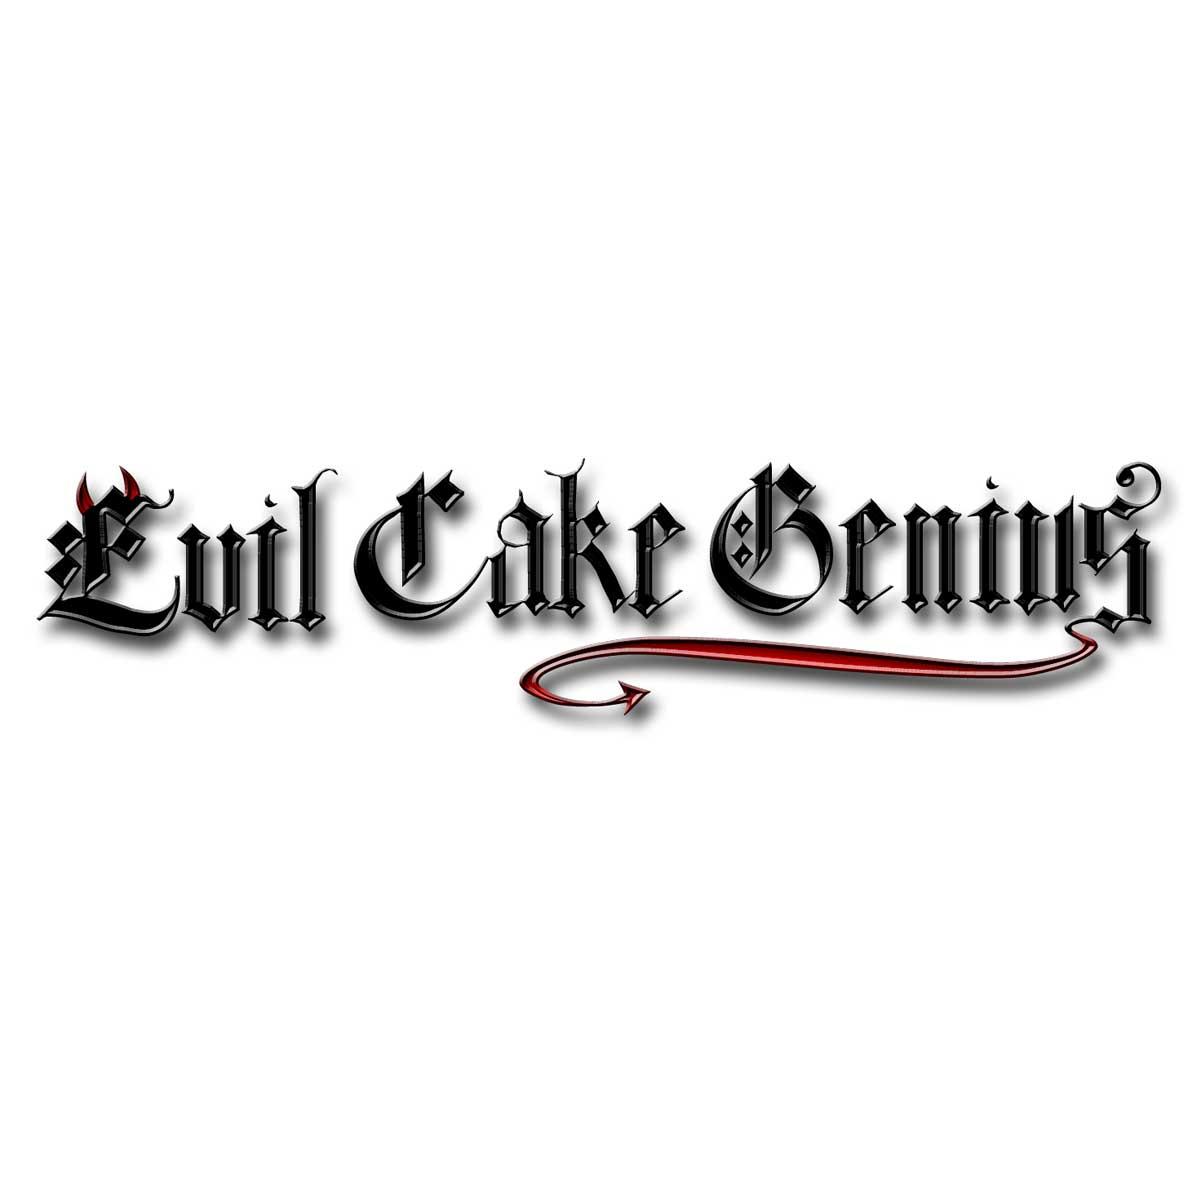 Gold Icing For Cakes Evil Cake Genius